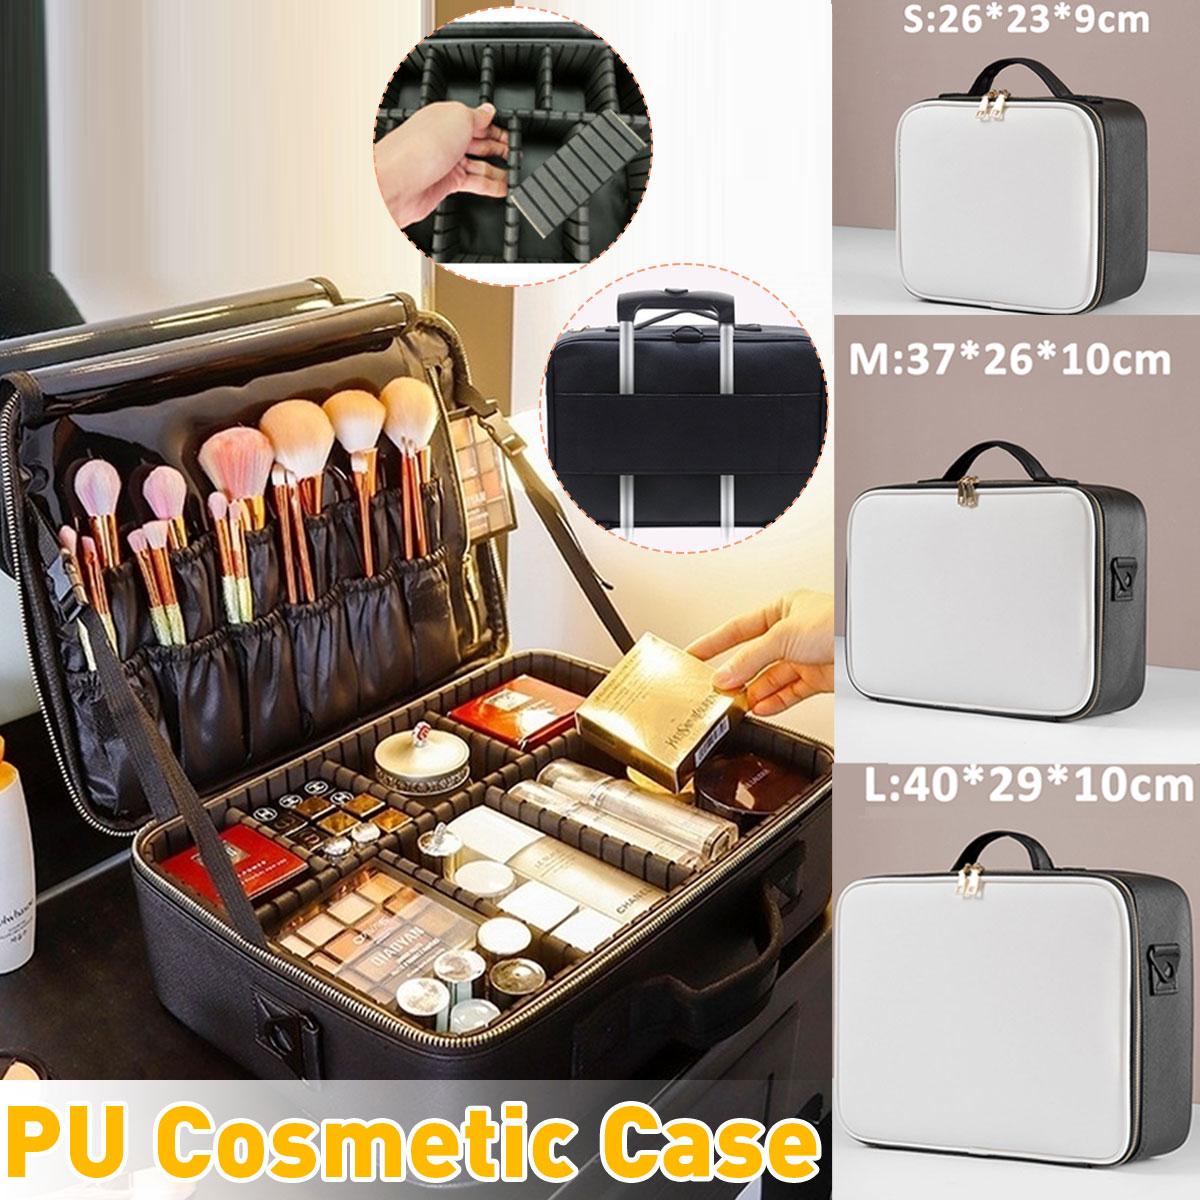 Upgrade Cosmetic Bag Makeup Organizer PU Waterproof Cosmetic Case Women Travel Large Capacity Storage Bag Suitcases Gifts